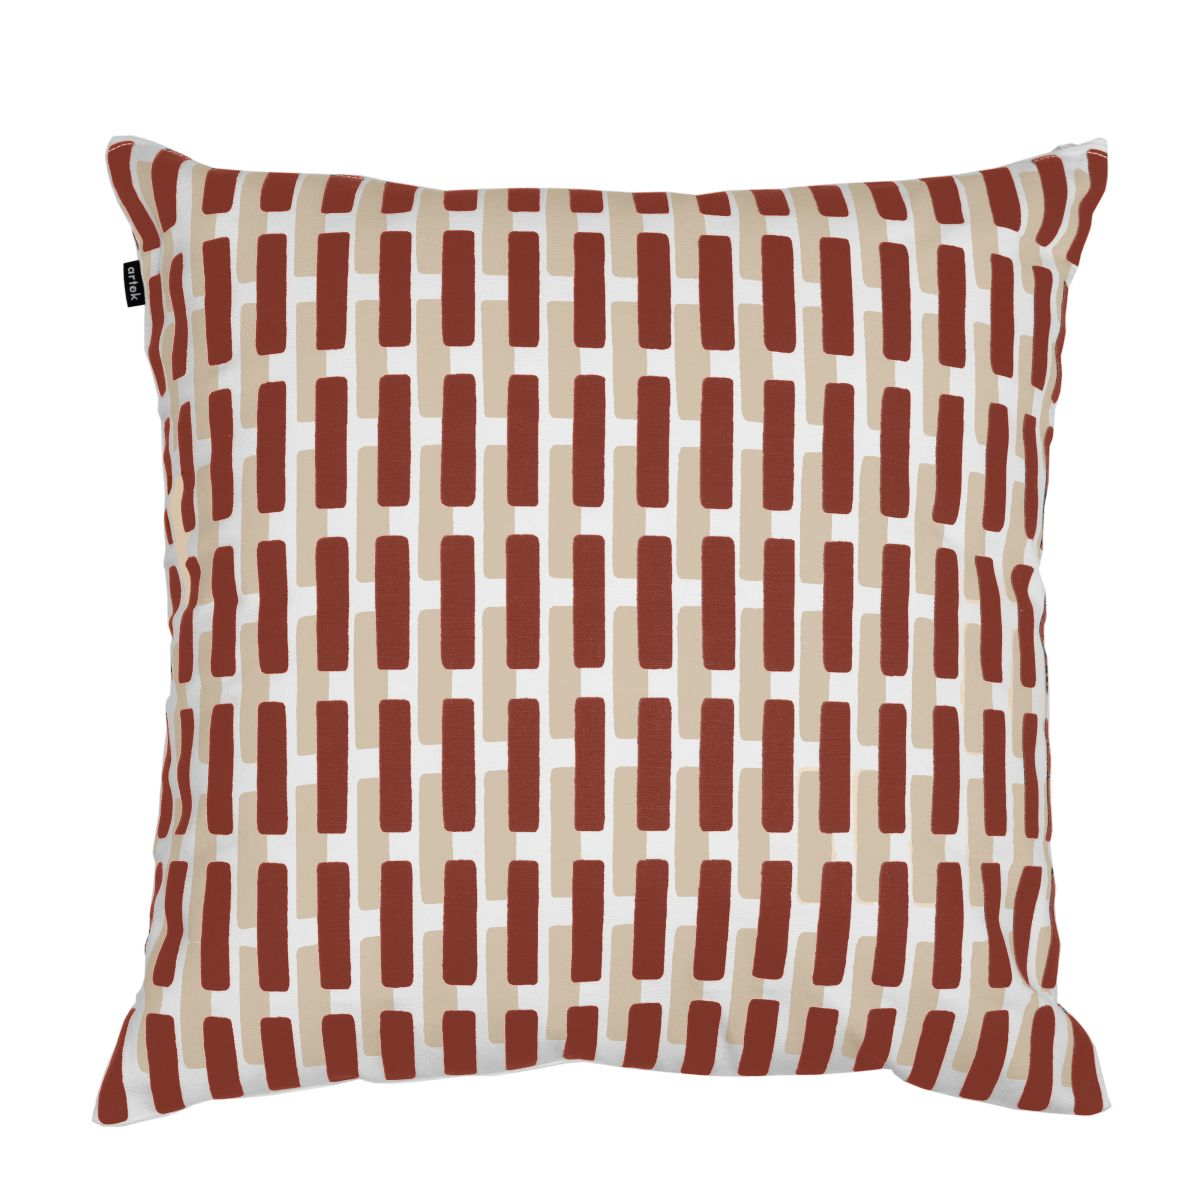 Siena-Cushion-Cover-Cotton-Canvas-large-50-x-50-cm-brick-sand-shadow-3976652